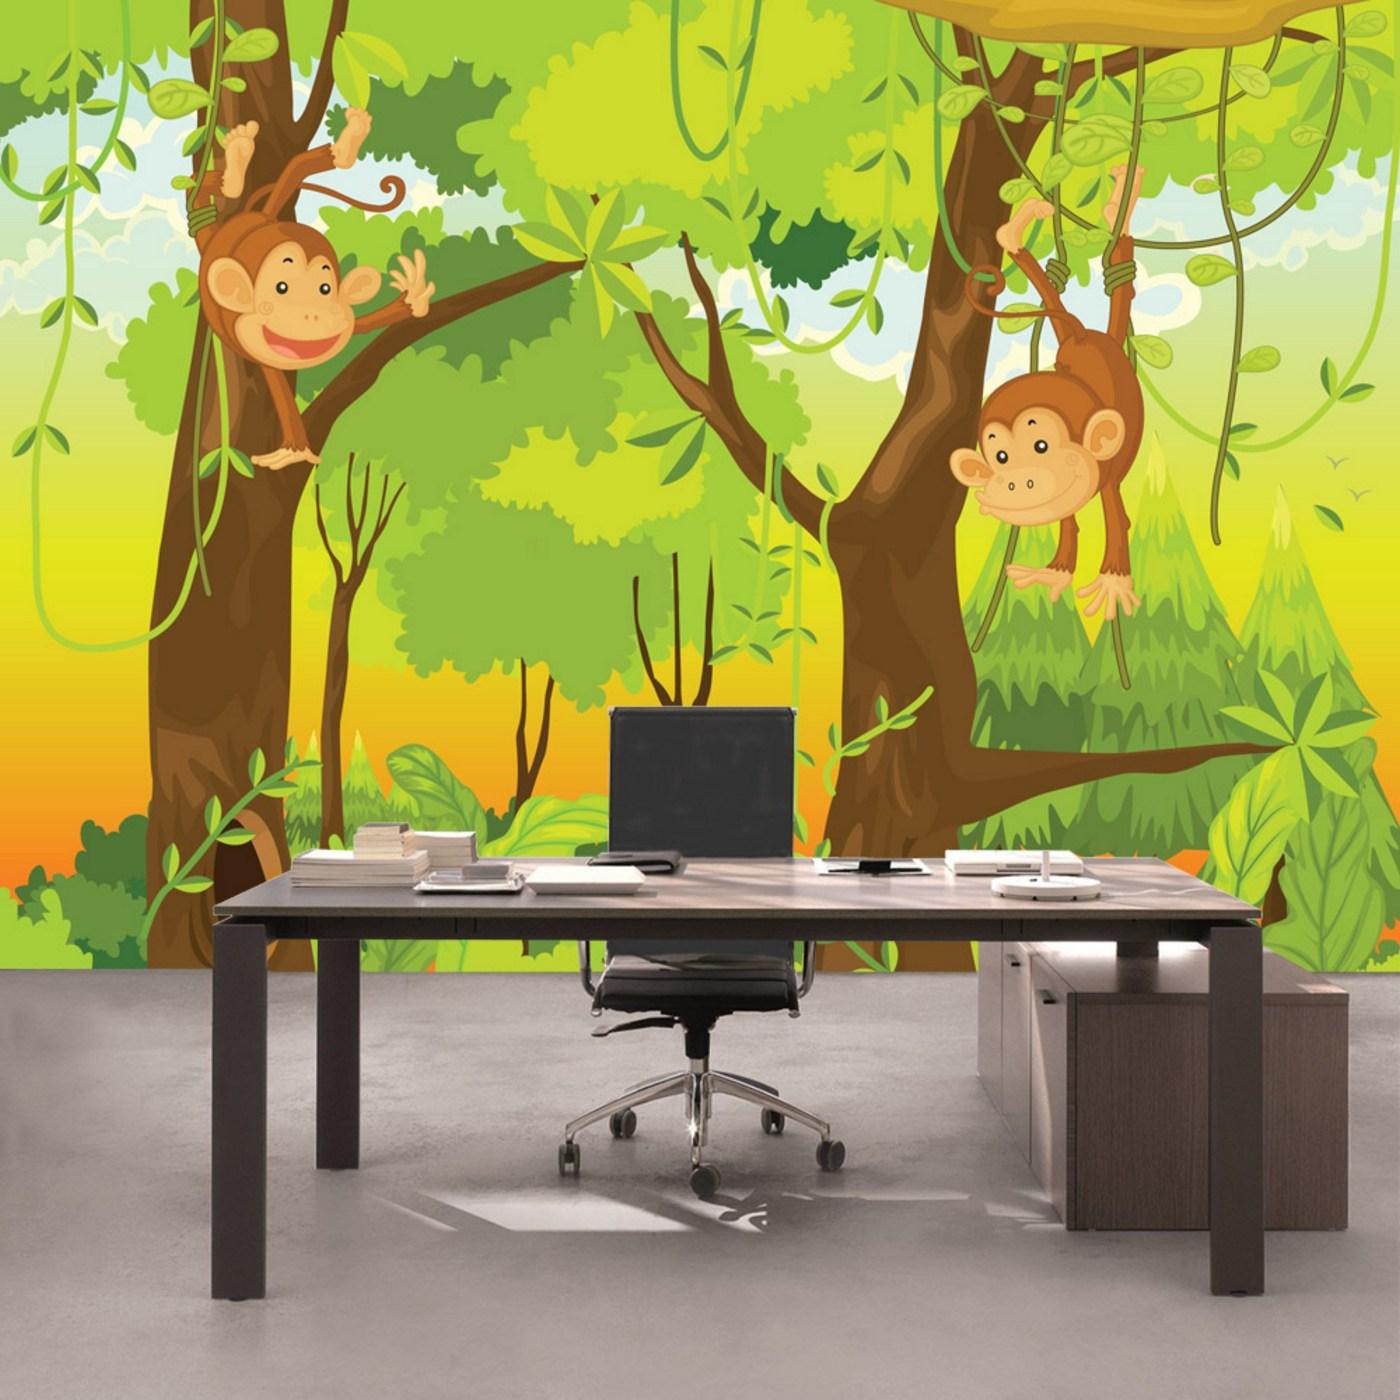 Fototapete kinderzimmer dschungel  KiSS!, Fototapeten zu besten Preisen. - Fototapete Jungle Animals ...